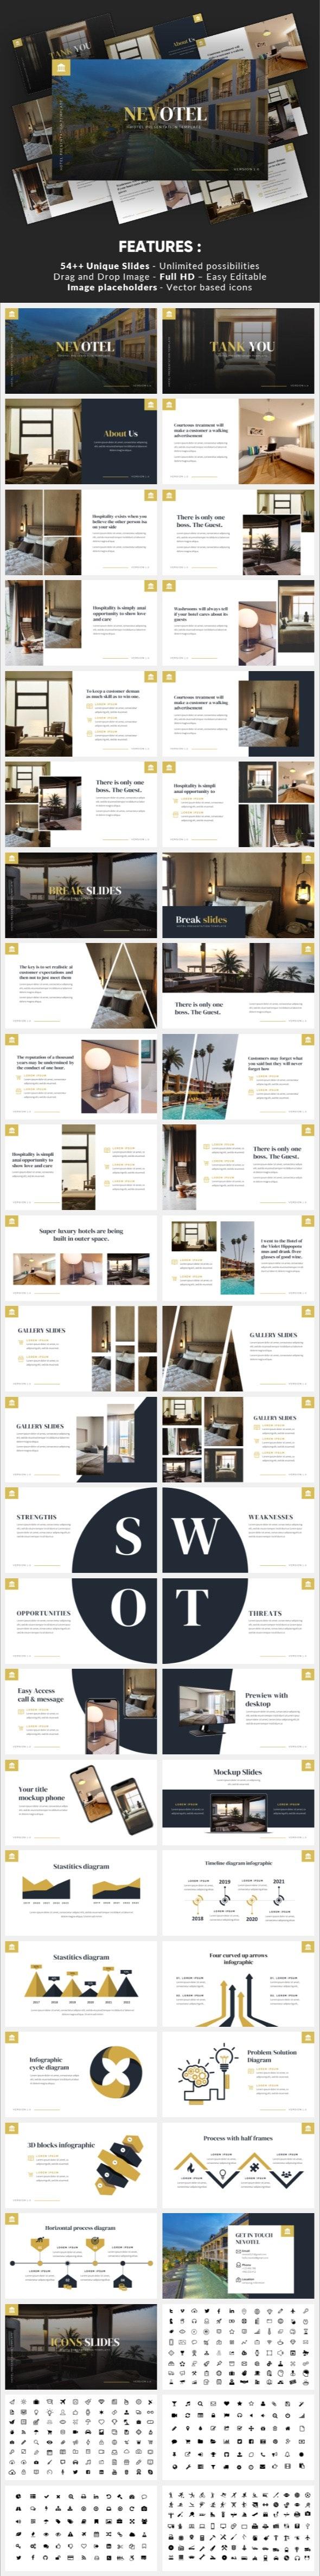 Nevotel - Luxury Hotel Keynote Template - Business Keynote Templates